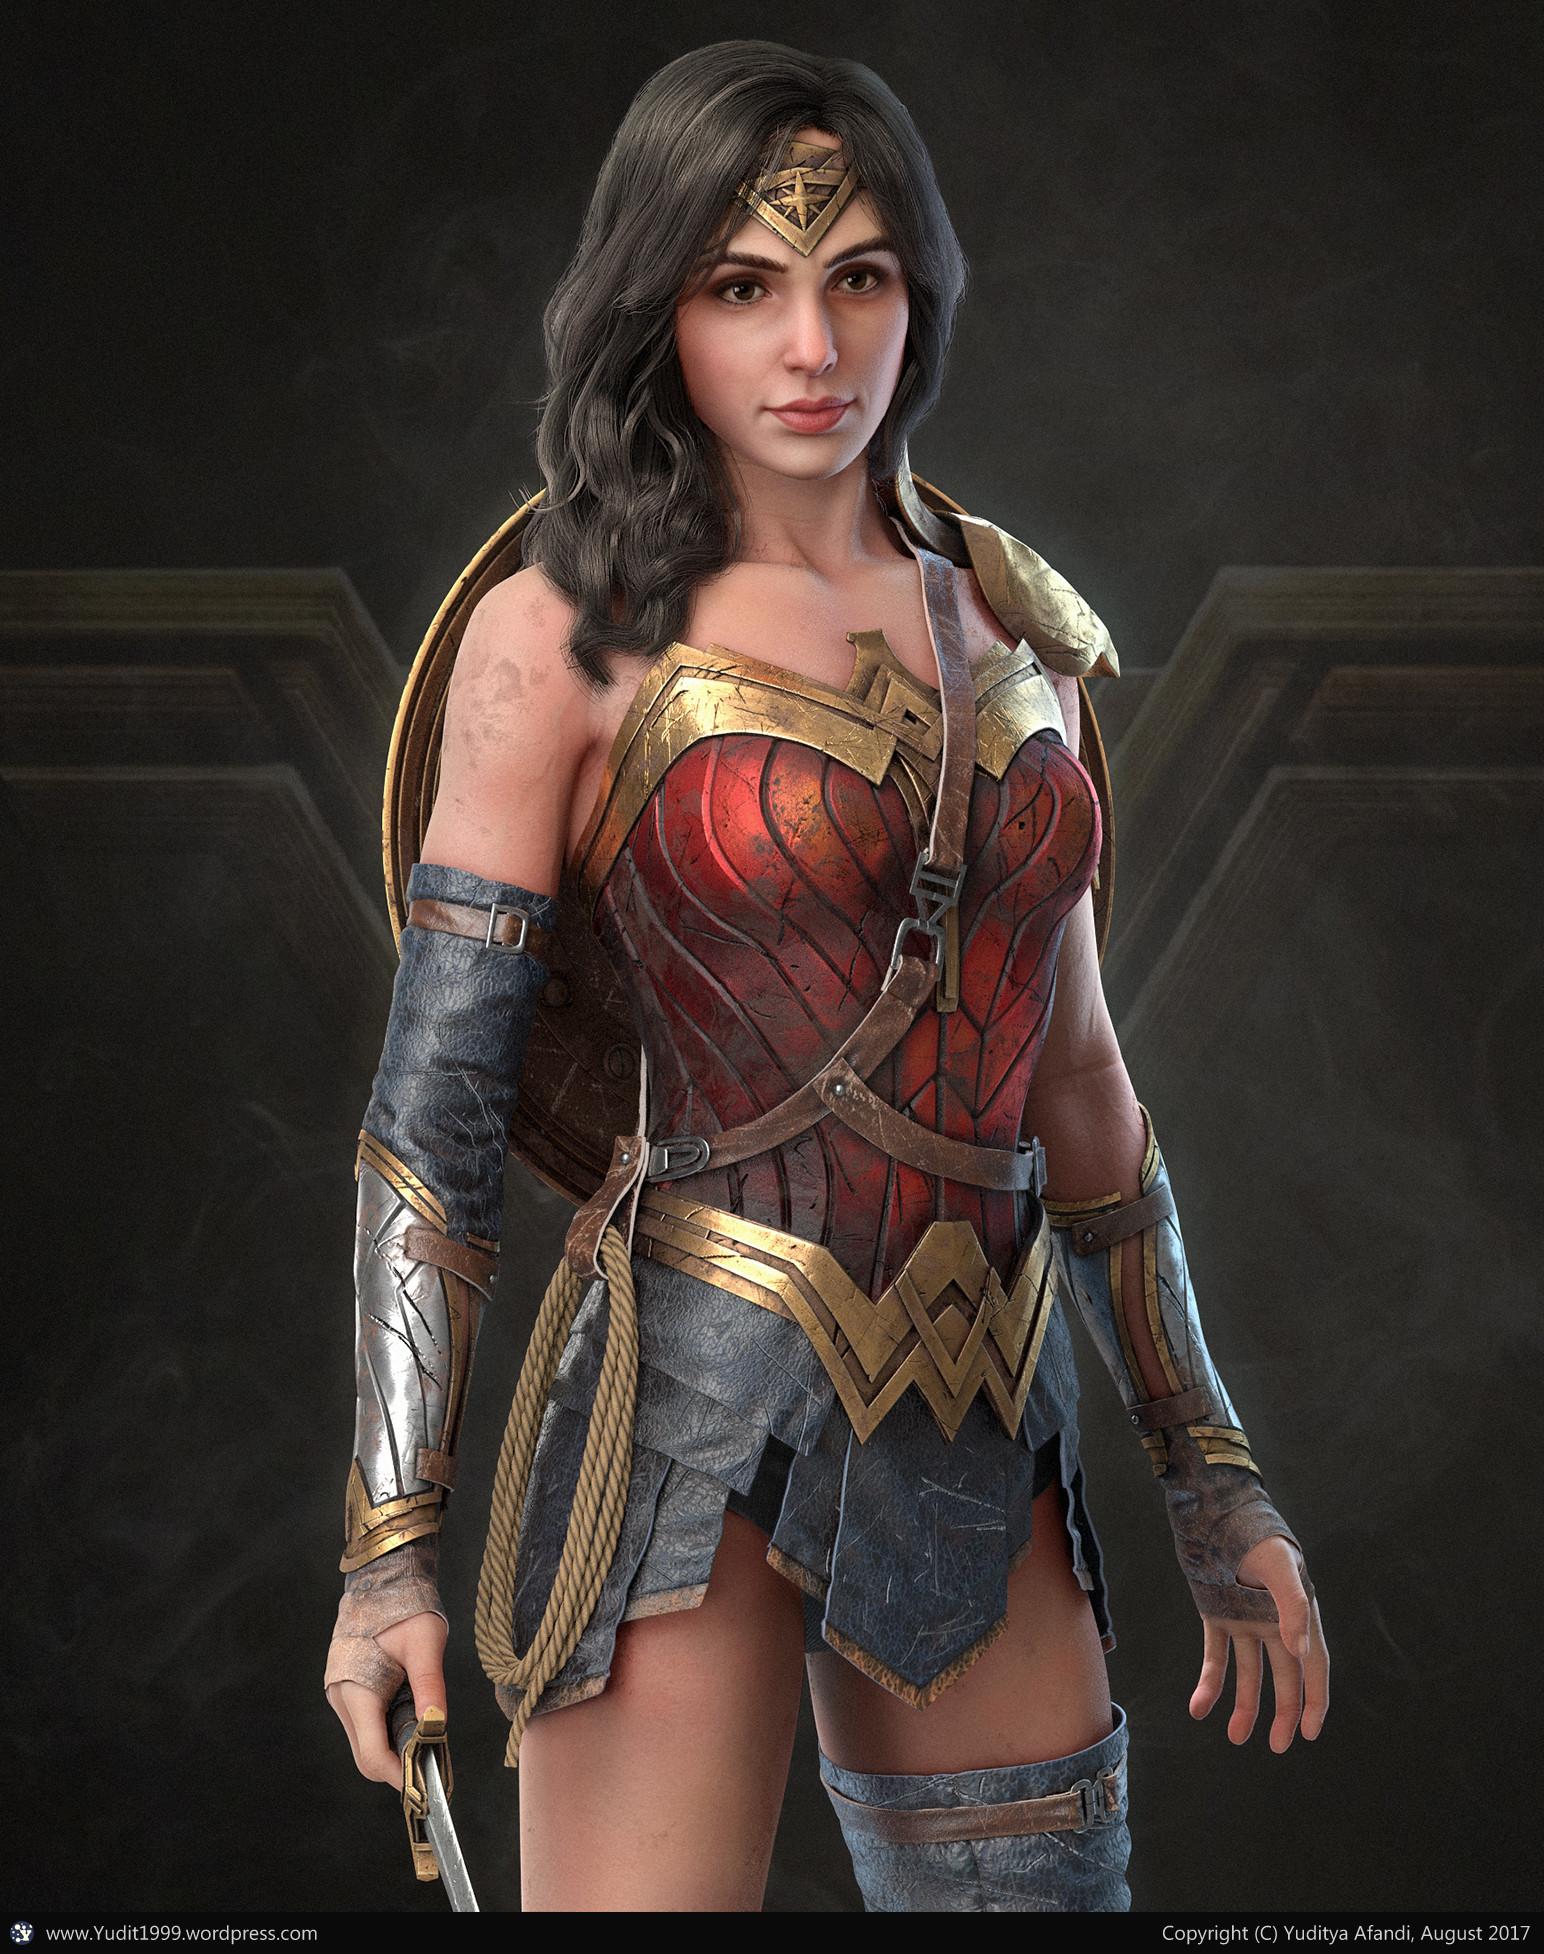 Wonder Woman by  Yuditya Afandi , using the  Metal  and  Manmade  textures.